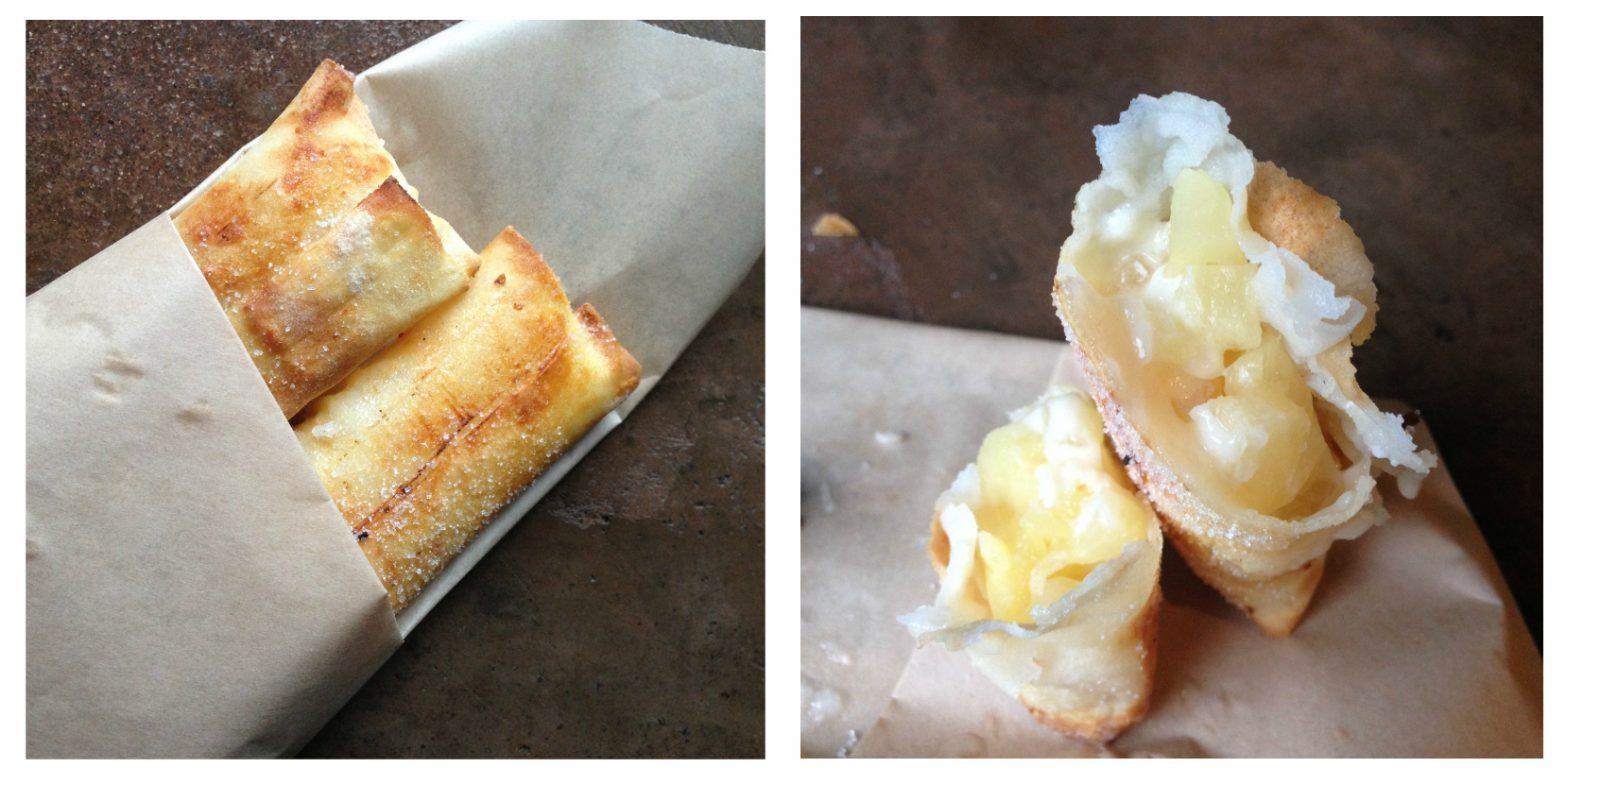 Pongu Lumpia (pineapple cream cheese spring rolls)